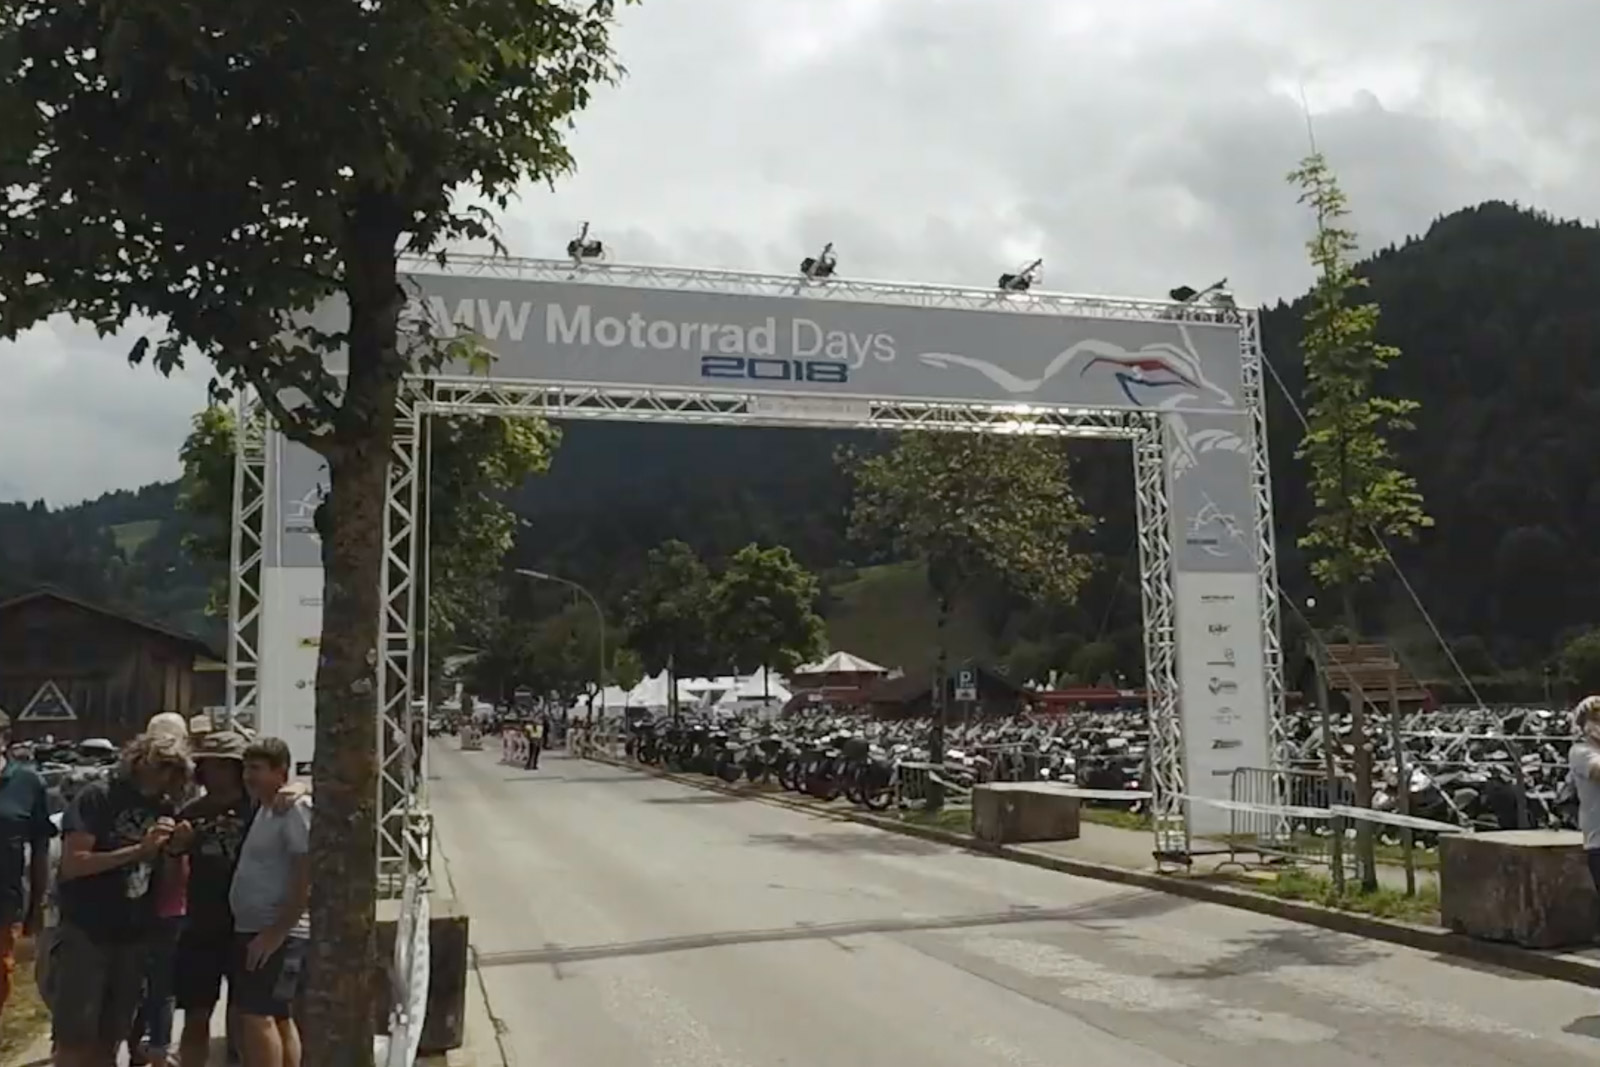 Motorrad-germany-motorcycling-europe